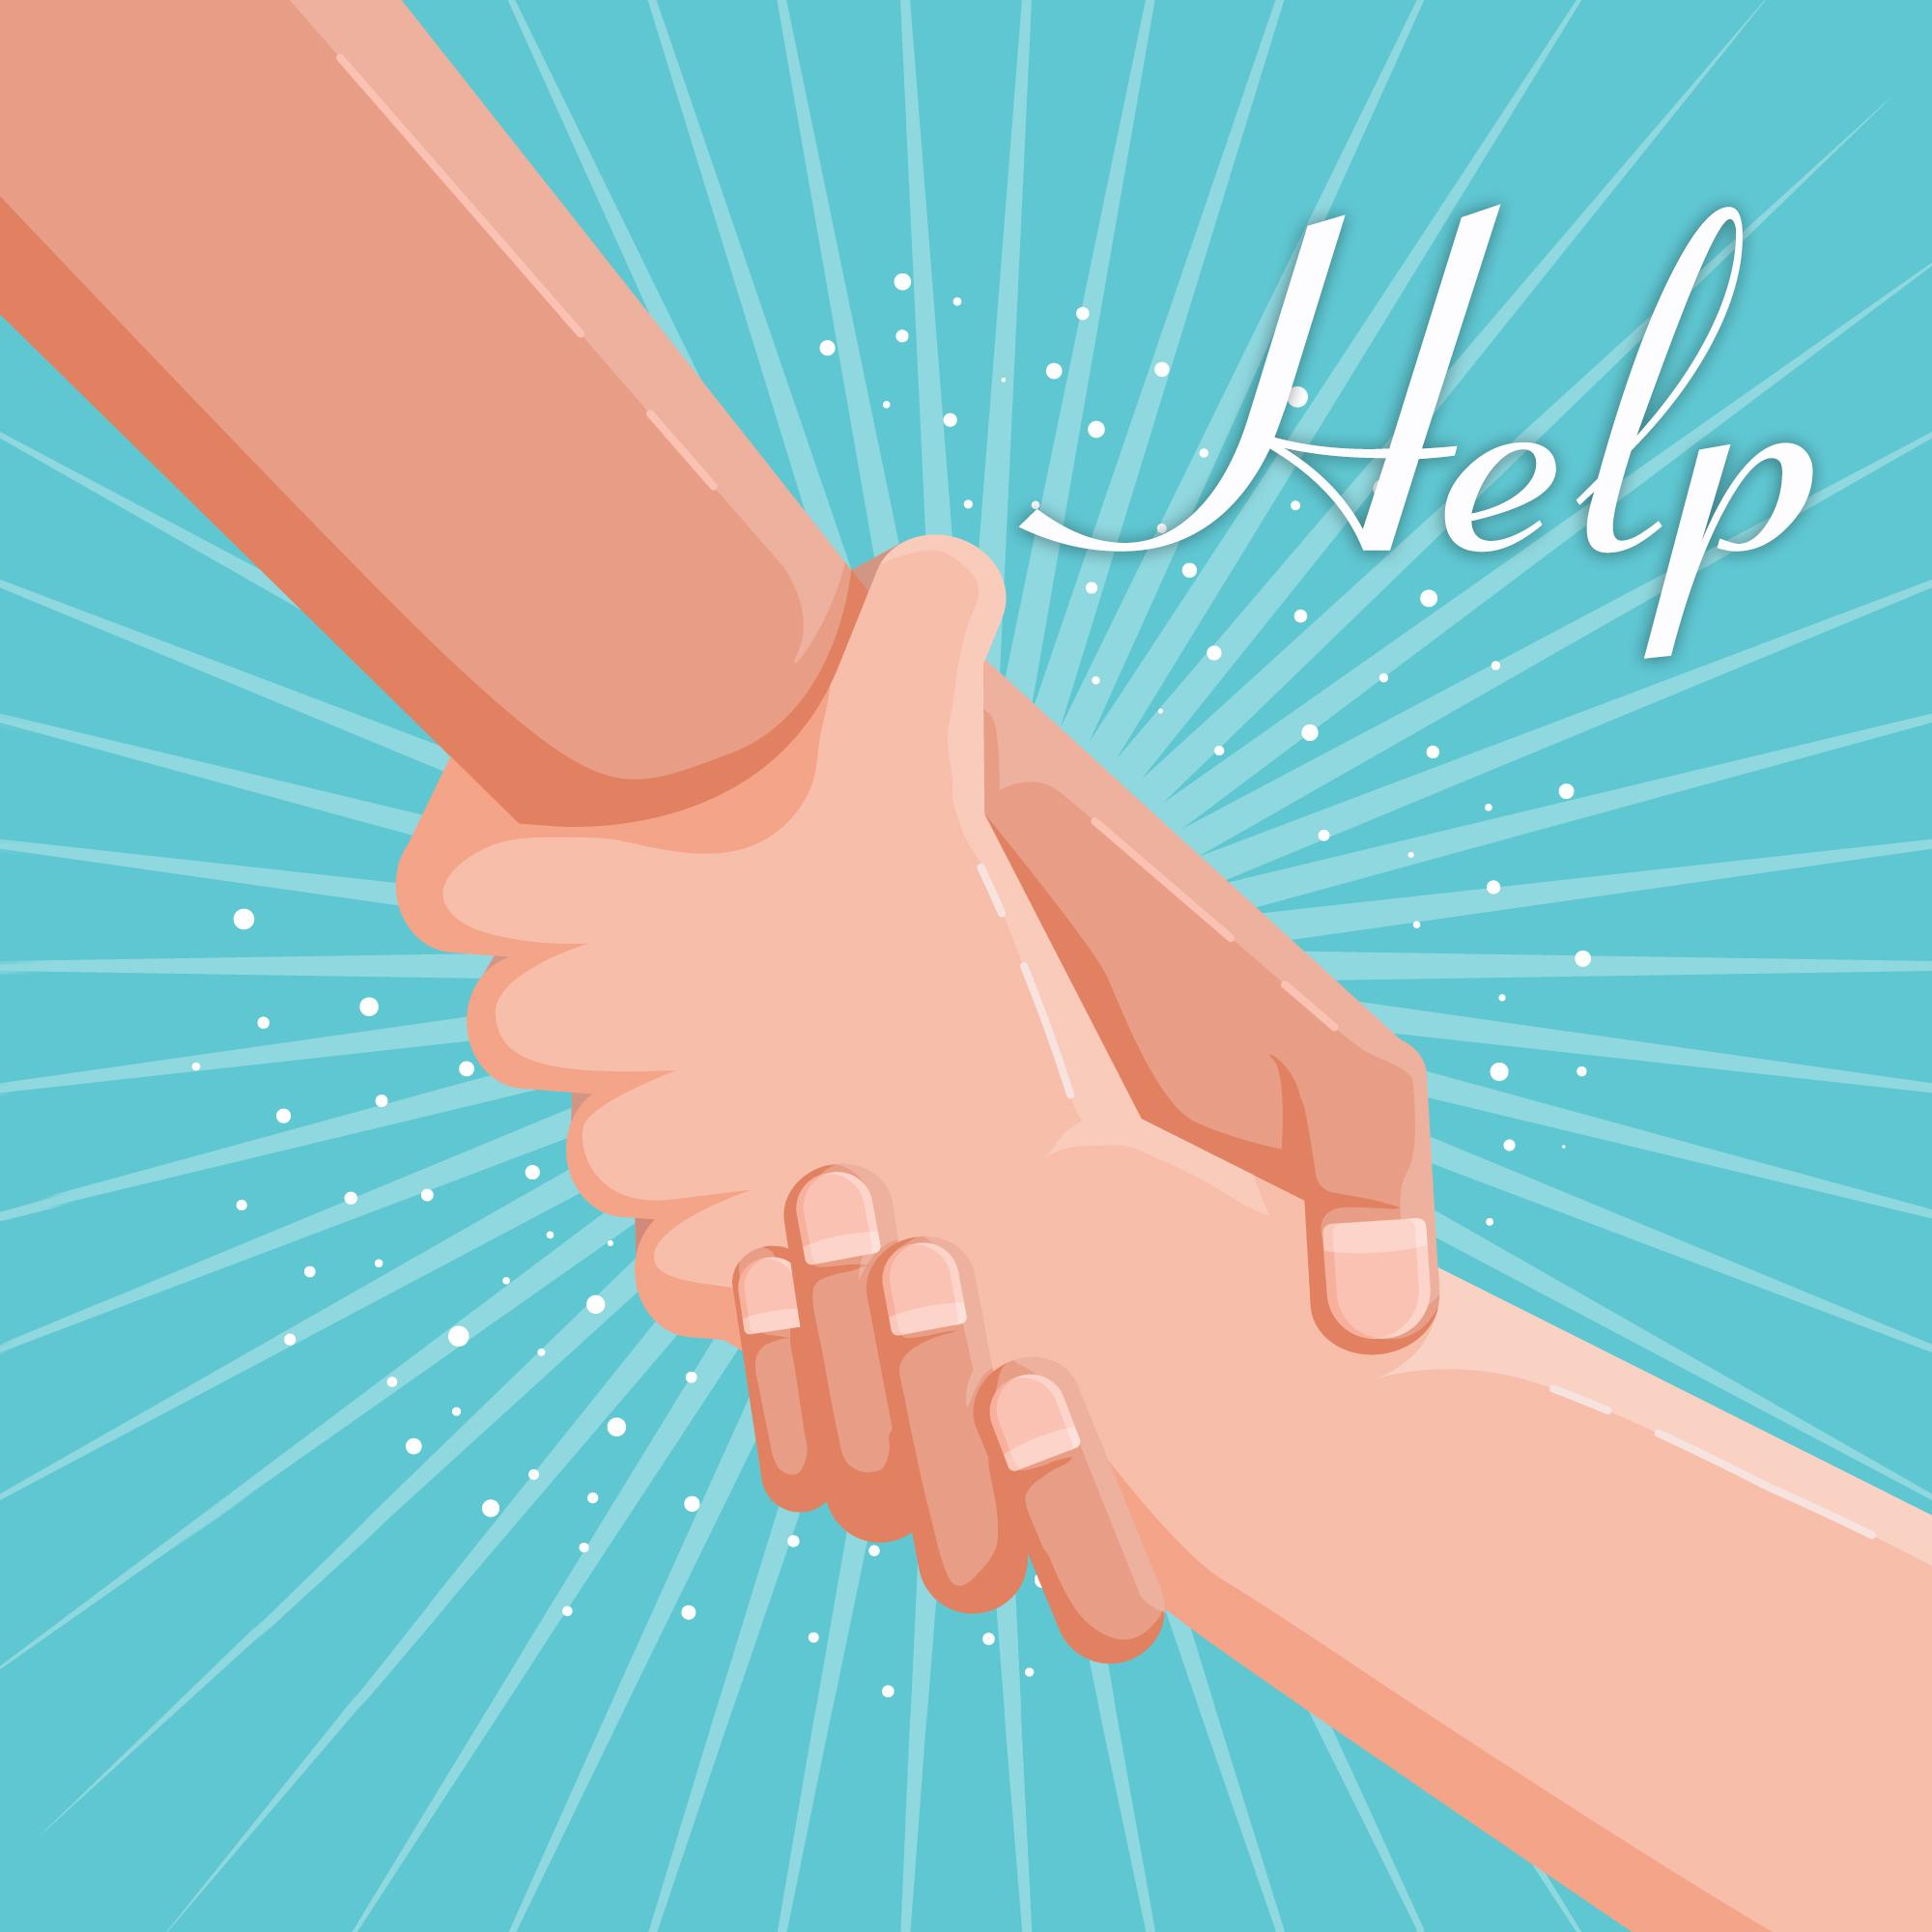 Ask for friends help - Inviter video invitation maker